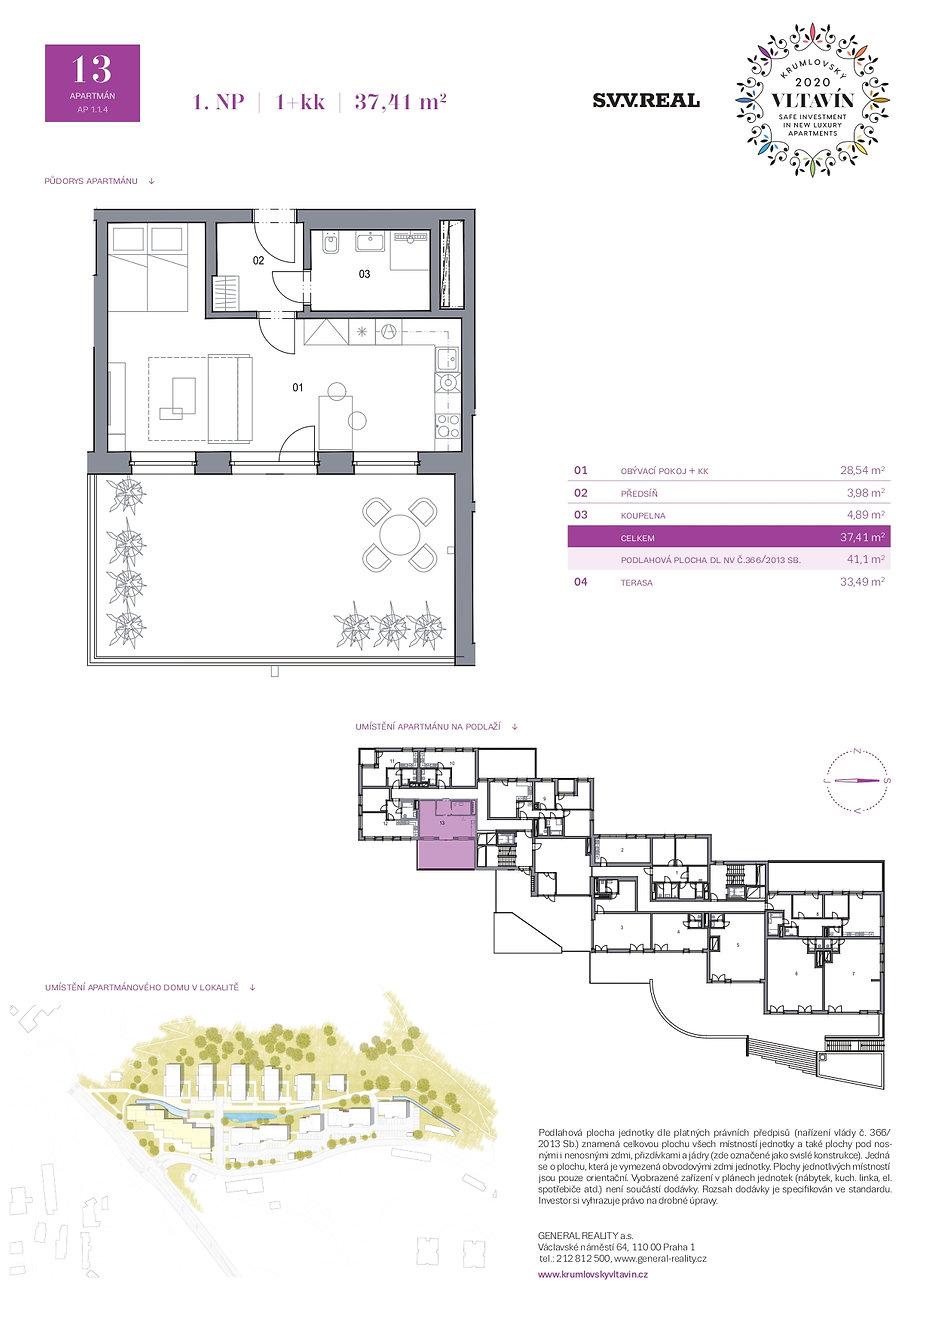 GR_krumlovsky-vltavin_bytove-karty-apartmany_1NP_A13_page-0001.jpg